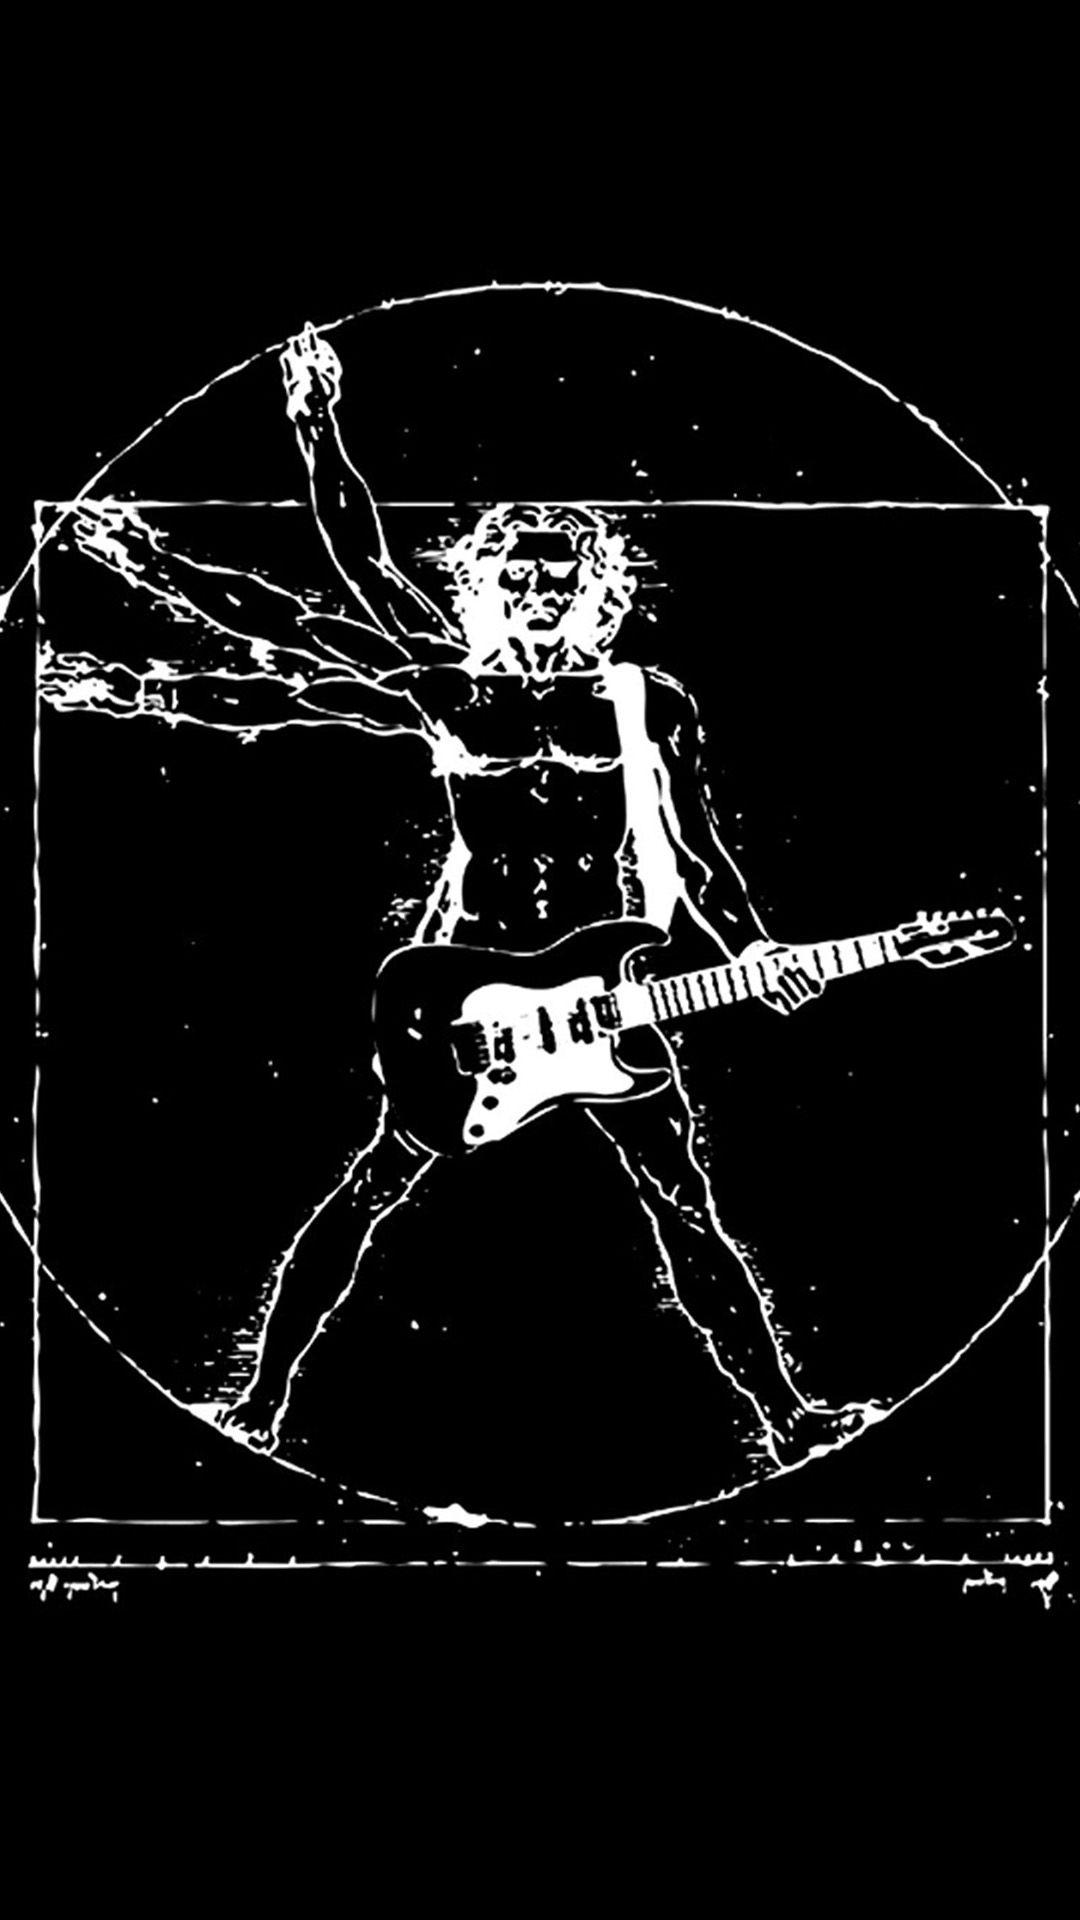 Funny Da Vinci Rock Hd Wallpaper Iphone 6 Plus Vitruvian Man Music Poster Art Parody